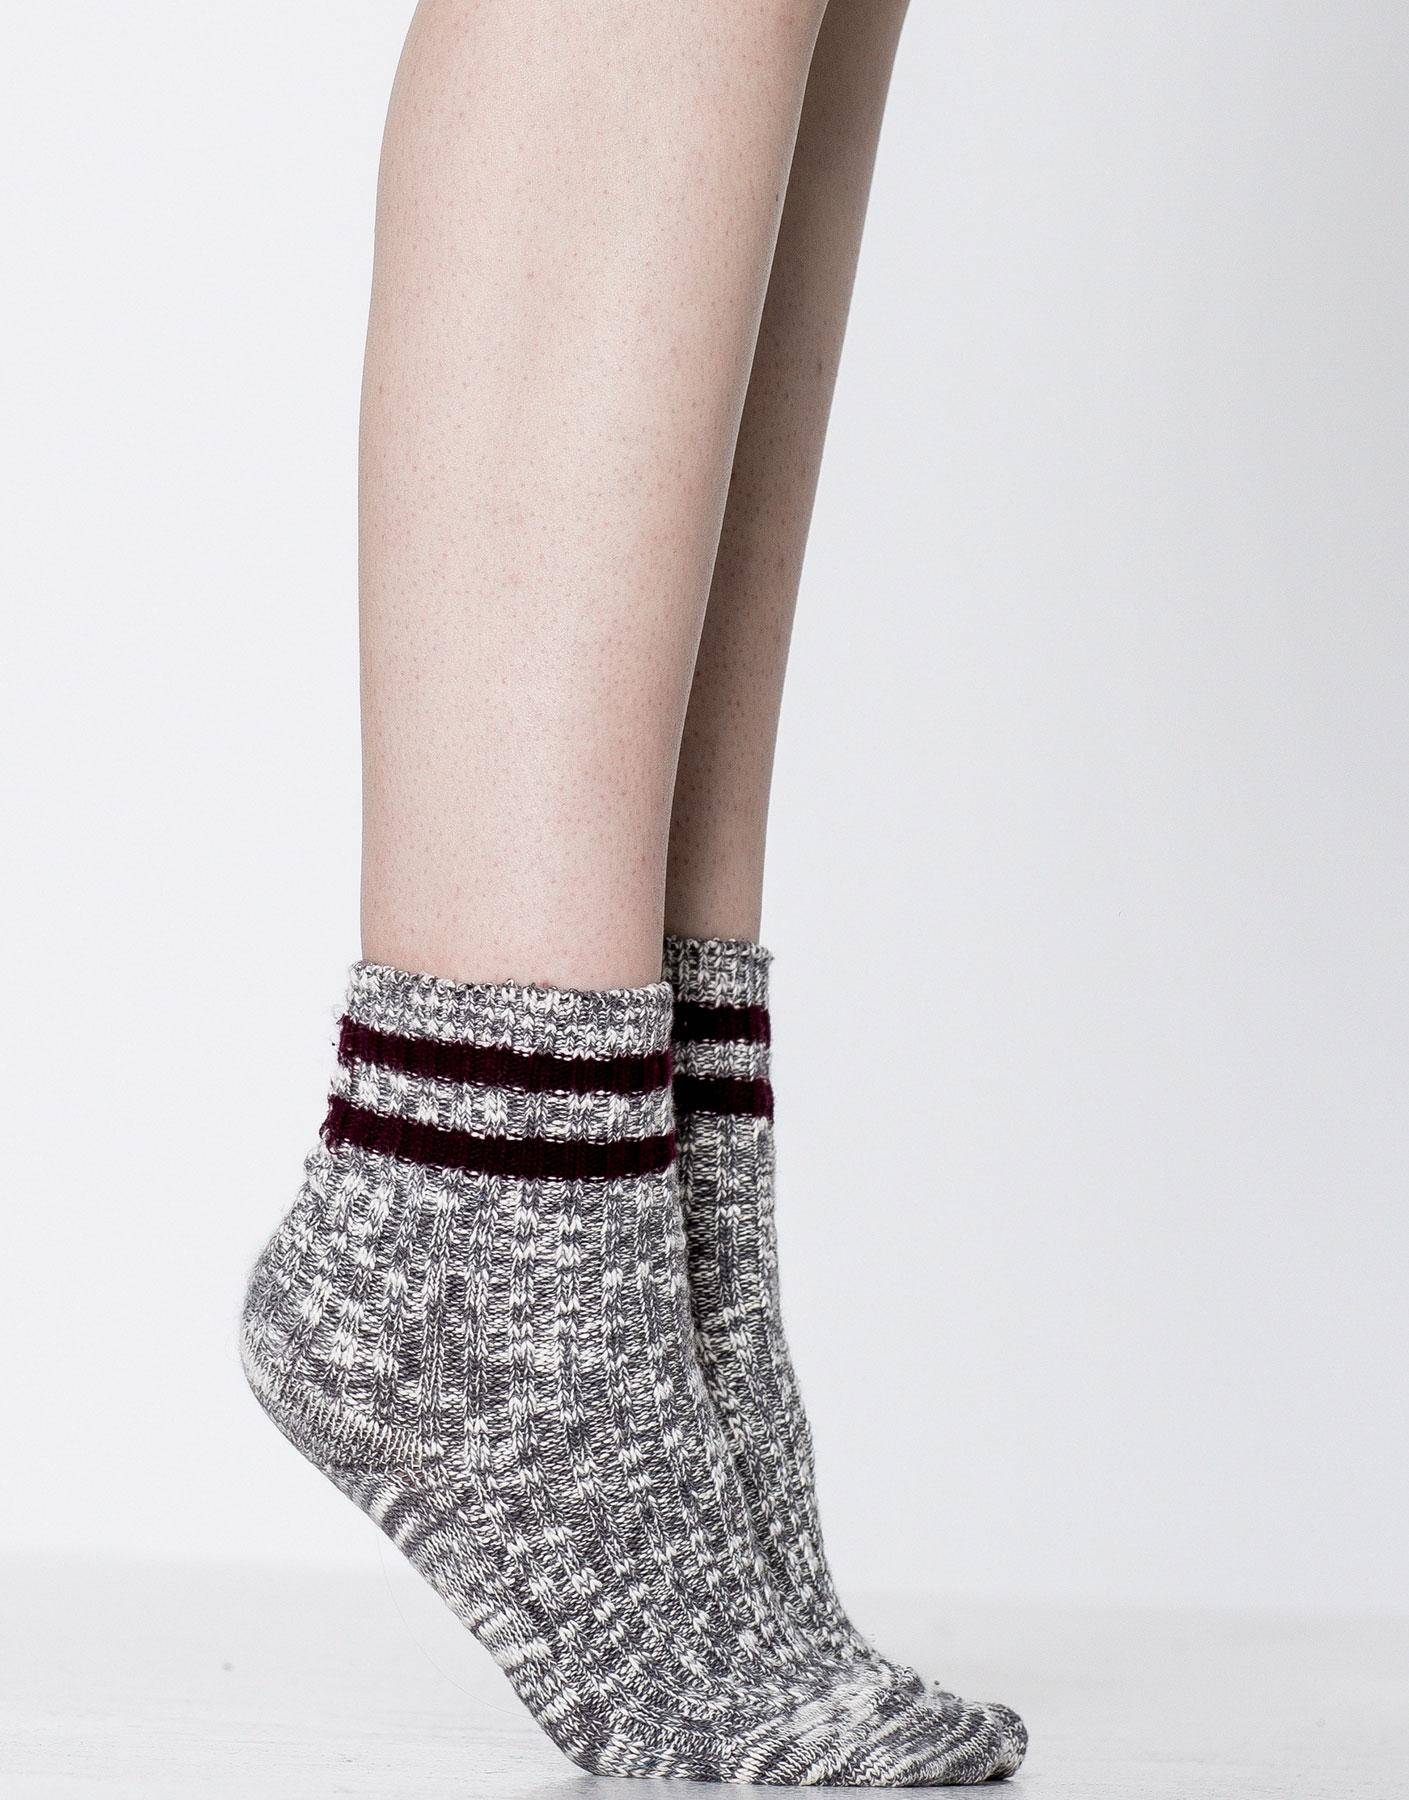 Maroon flecked socks